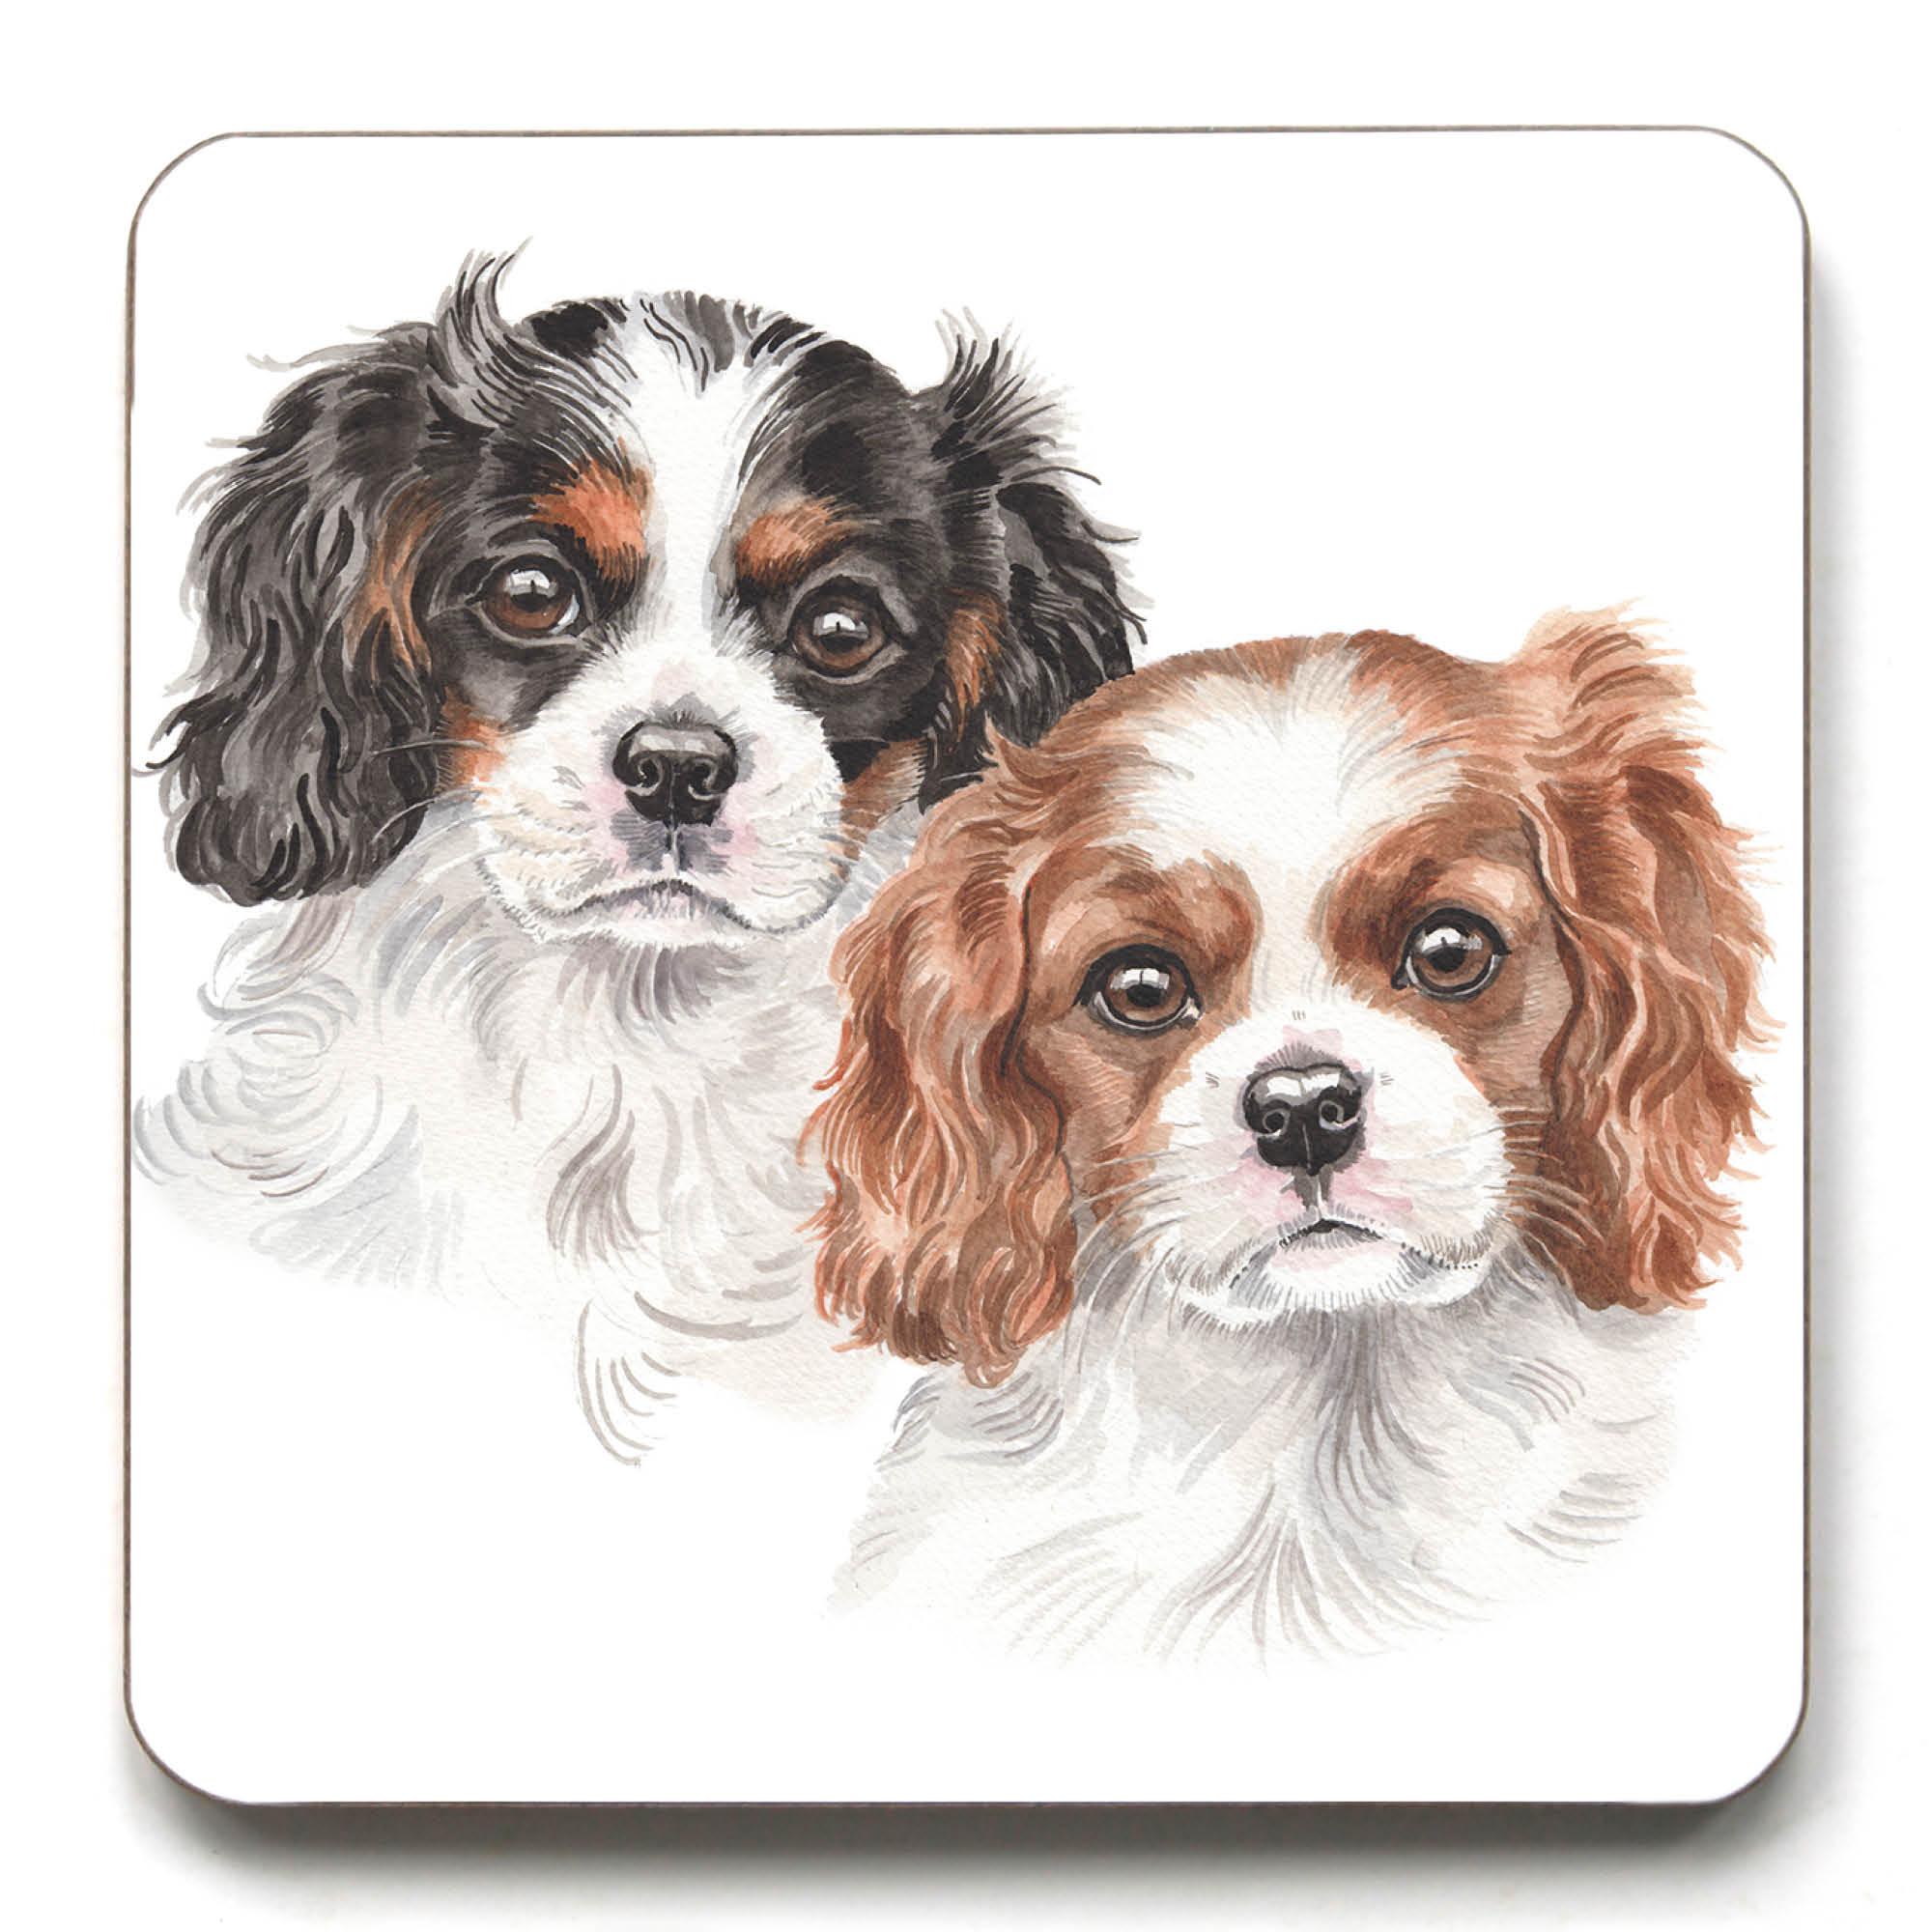 Cavalier King Charles Spaniel Puppies Coaster Cst Pu04 Waggydogz